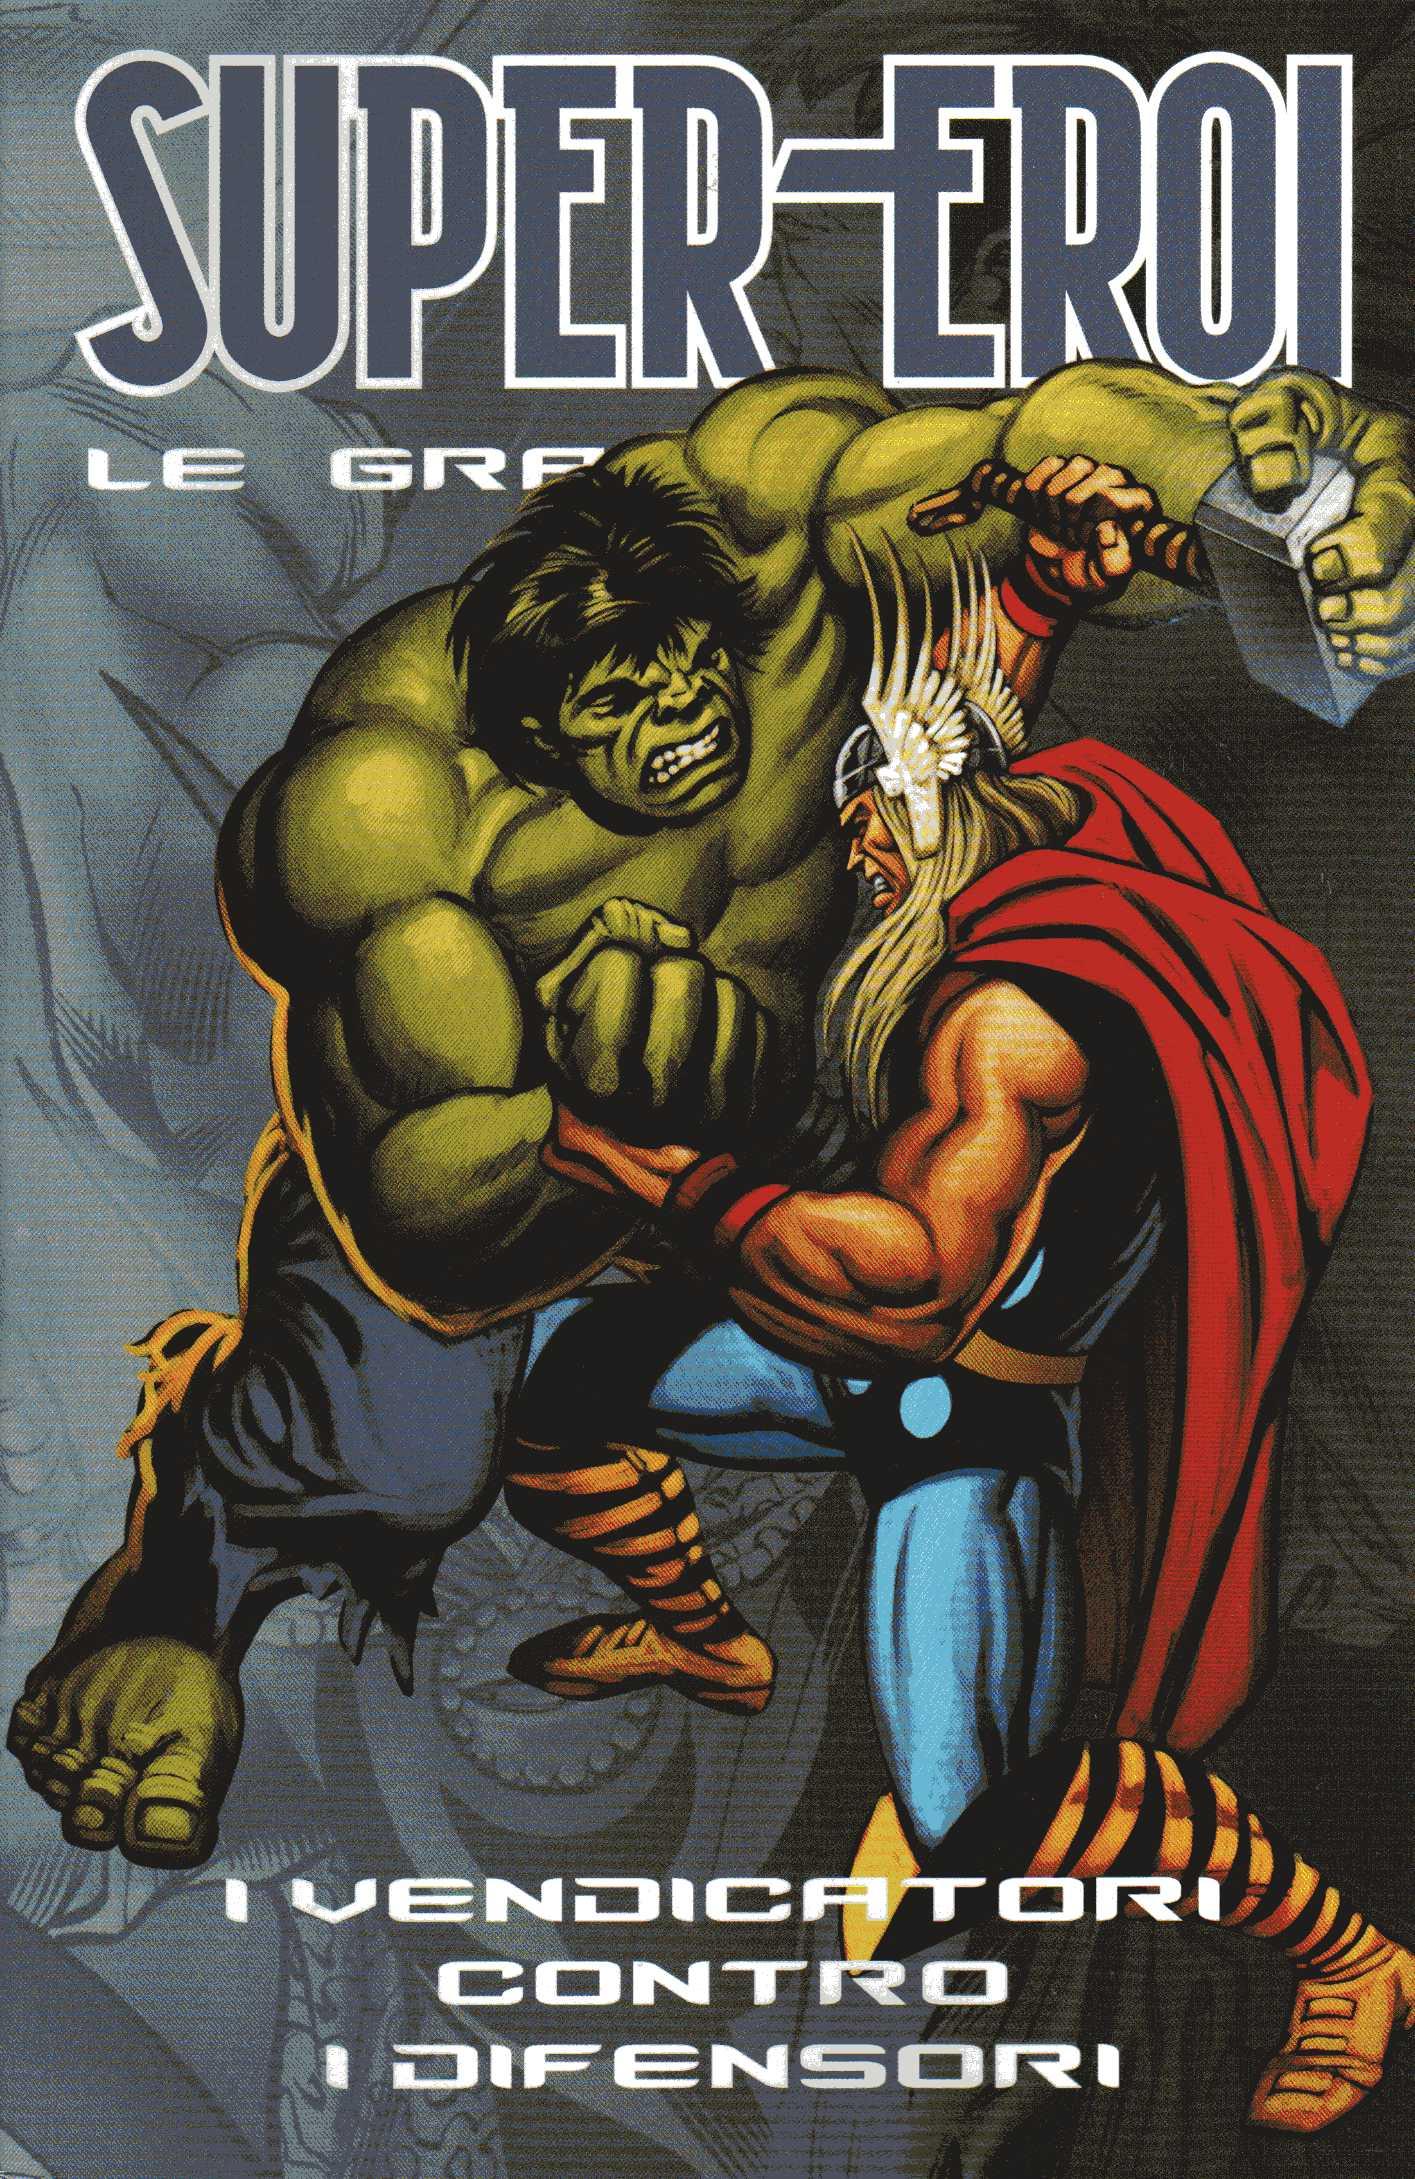 Supereroi - Le grandi saghe vol. 17